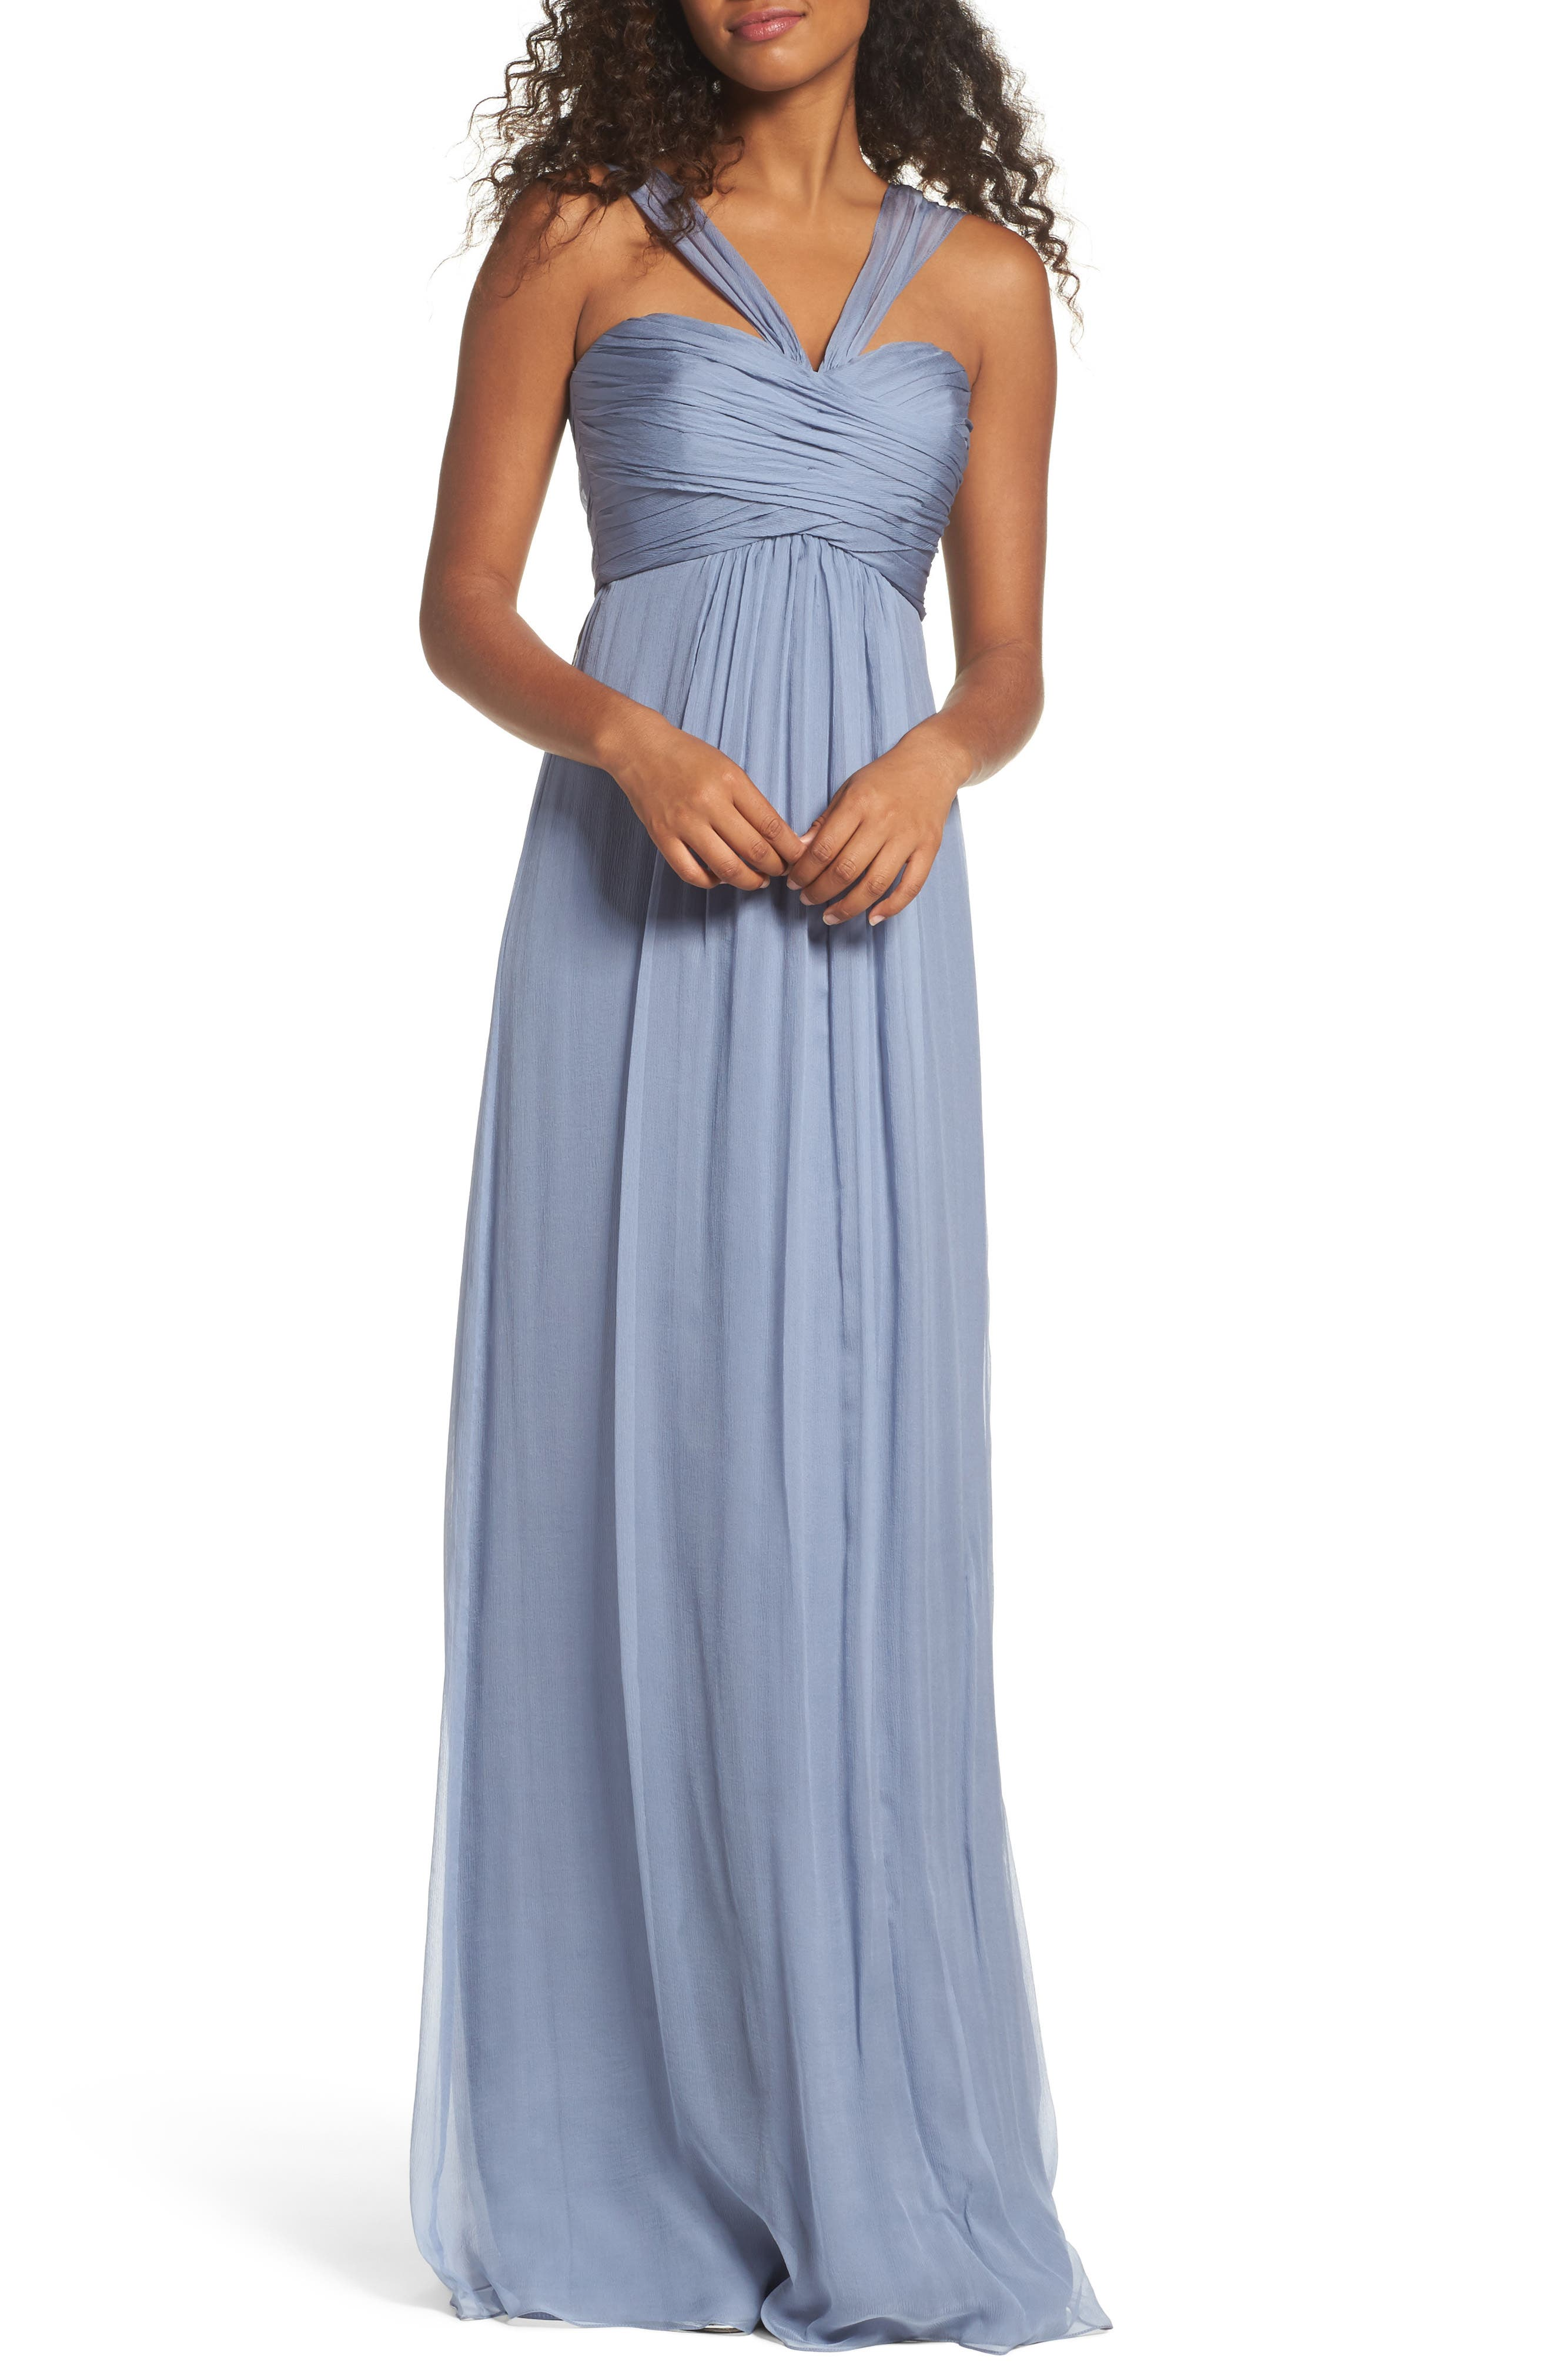 Corbin Crinkled Chiffon Empire Gown,                         Main,                         color, 020